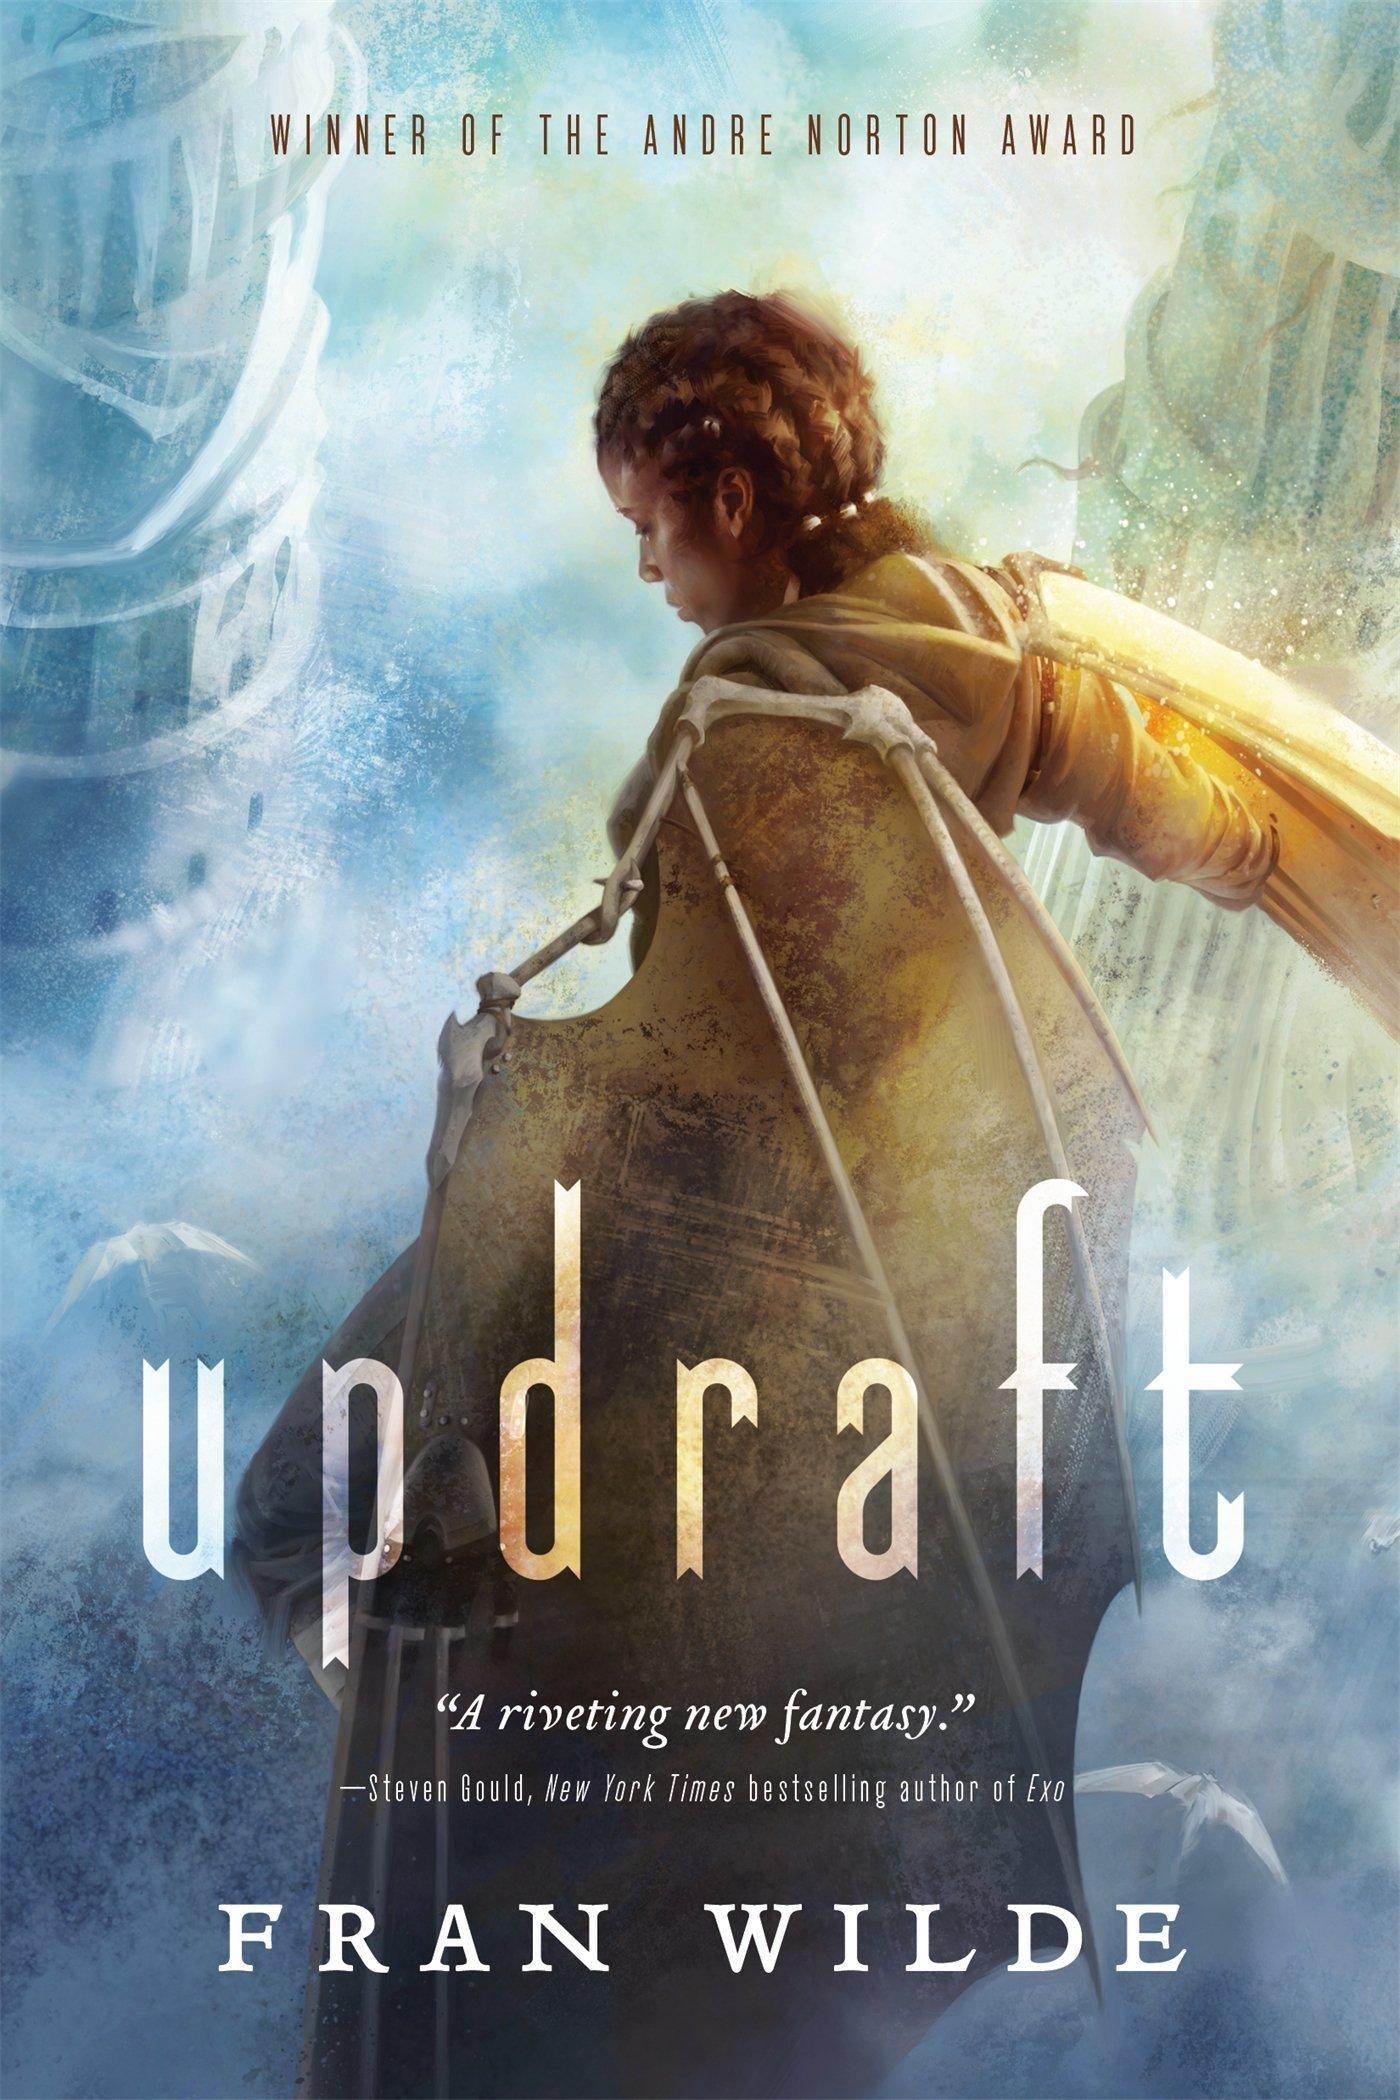 BWW Review: UPDRAFT by Fran Wilde